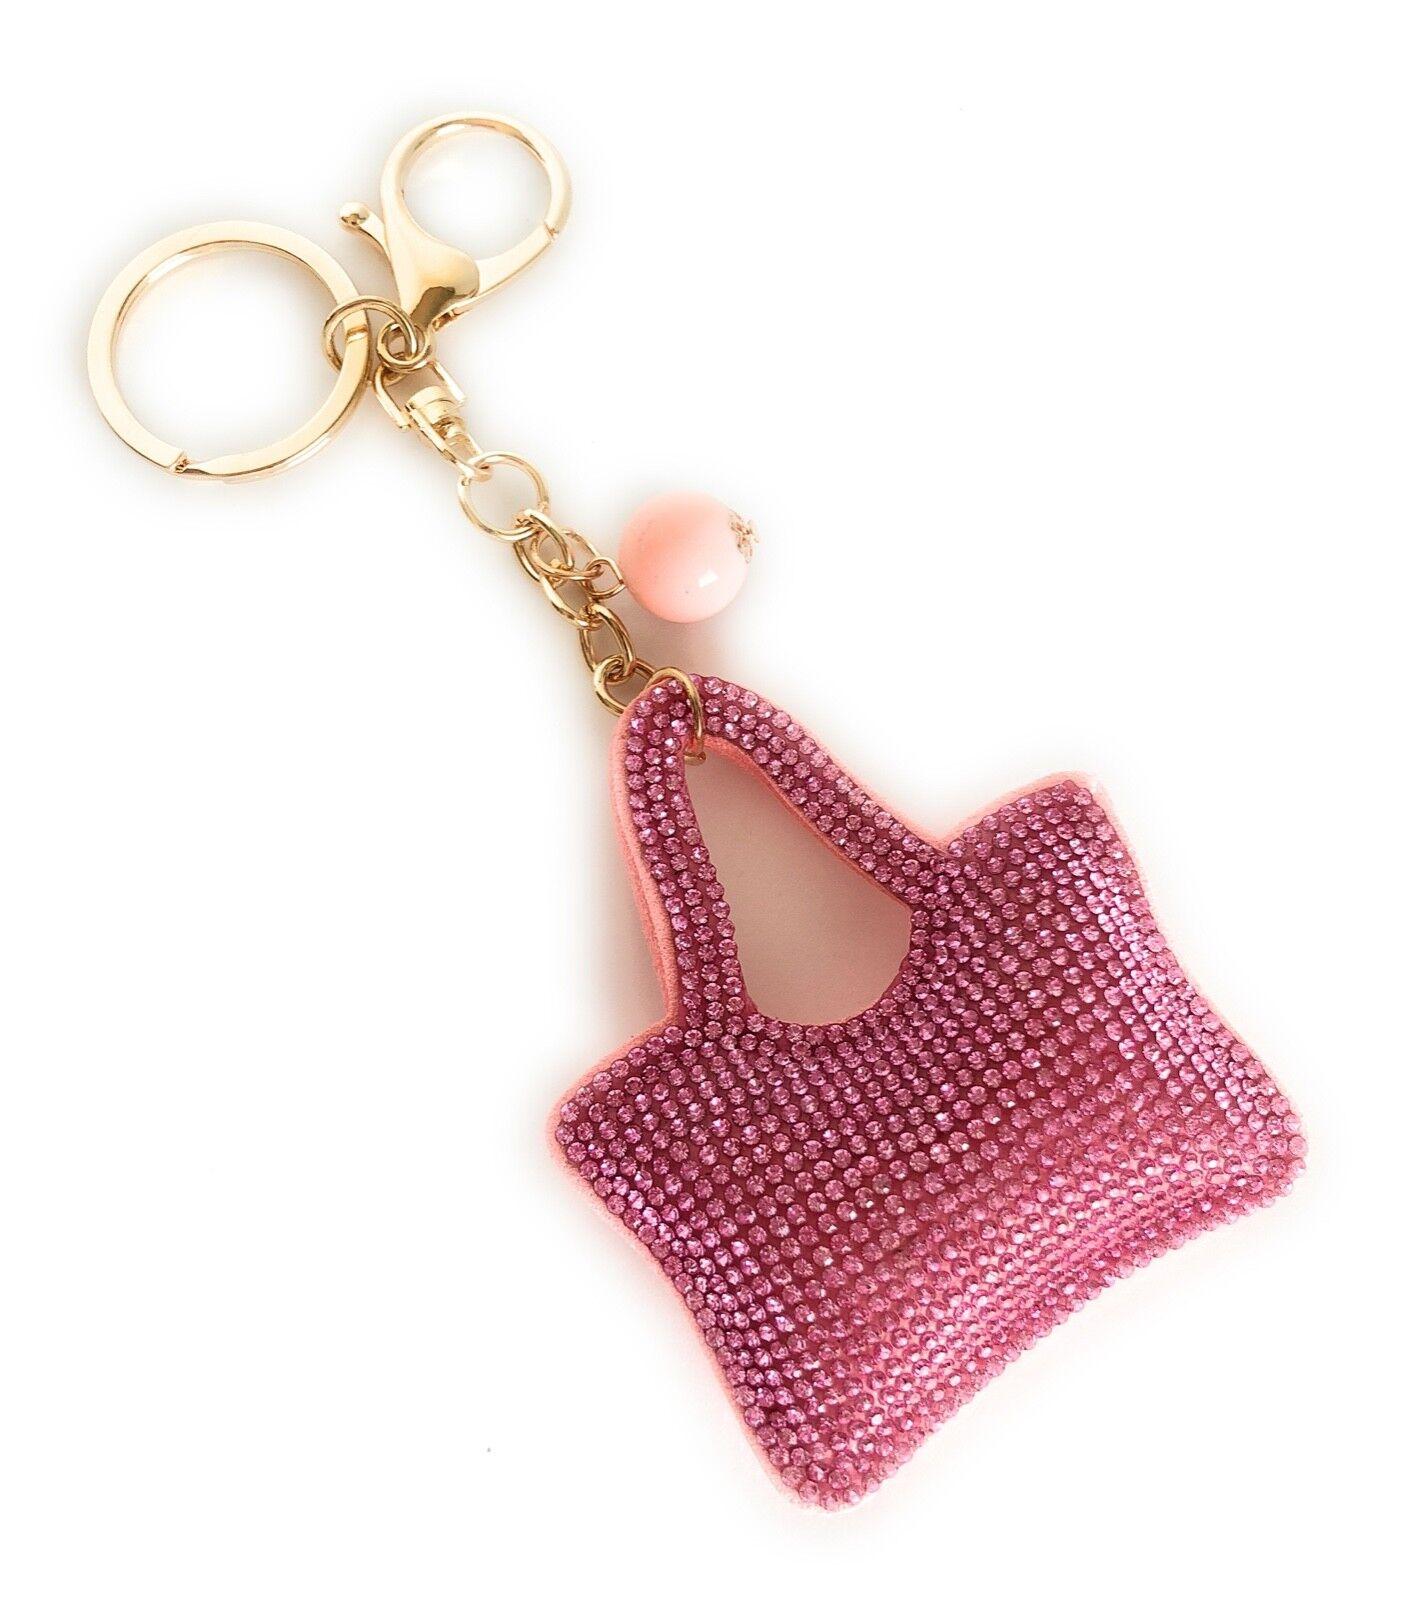 Cute Pink Cushion Keychain bag for Women Handbag Charms Acce